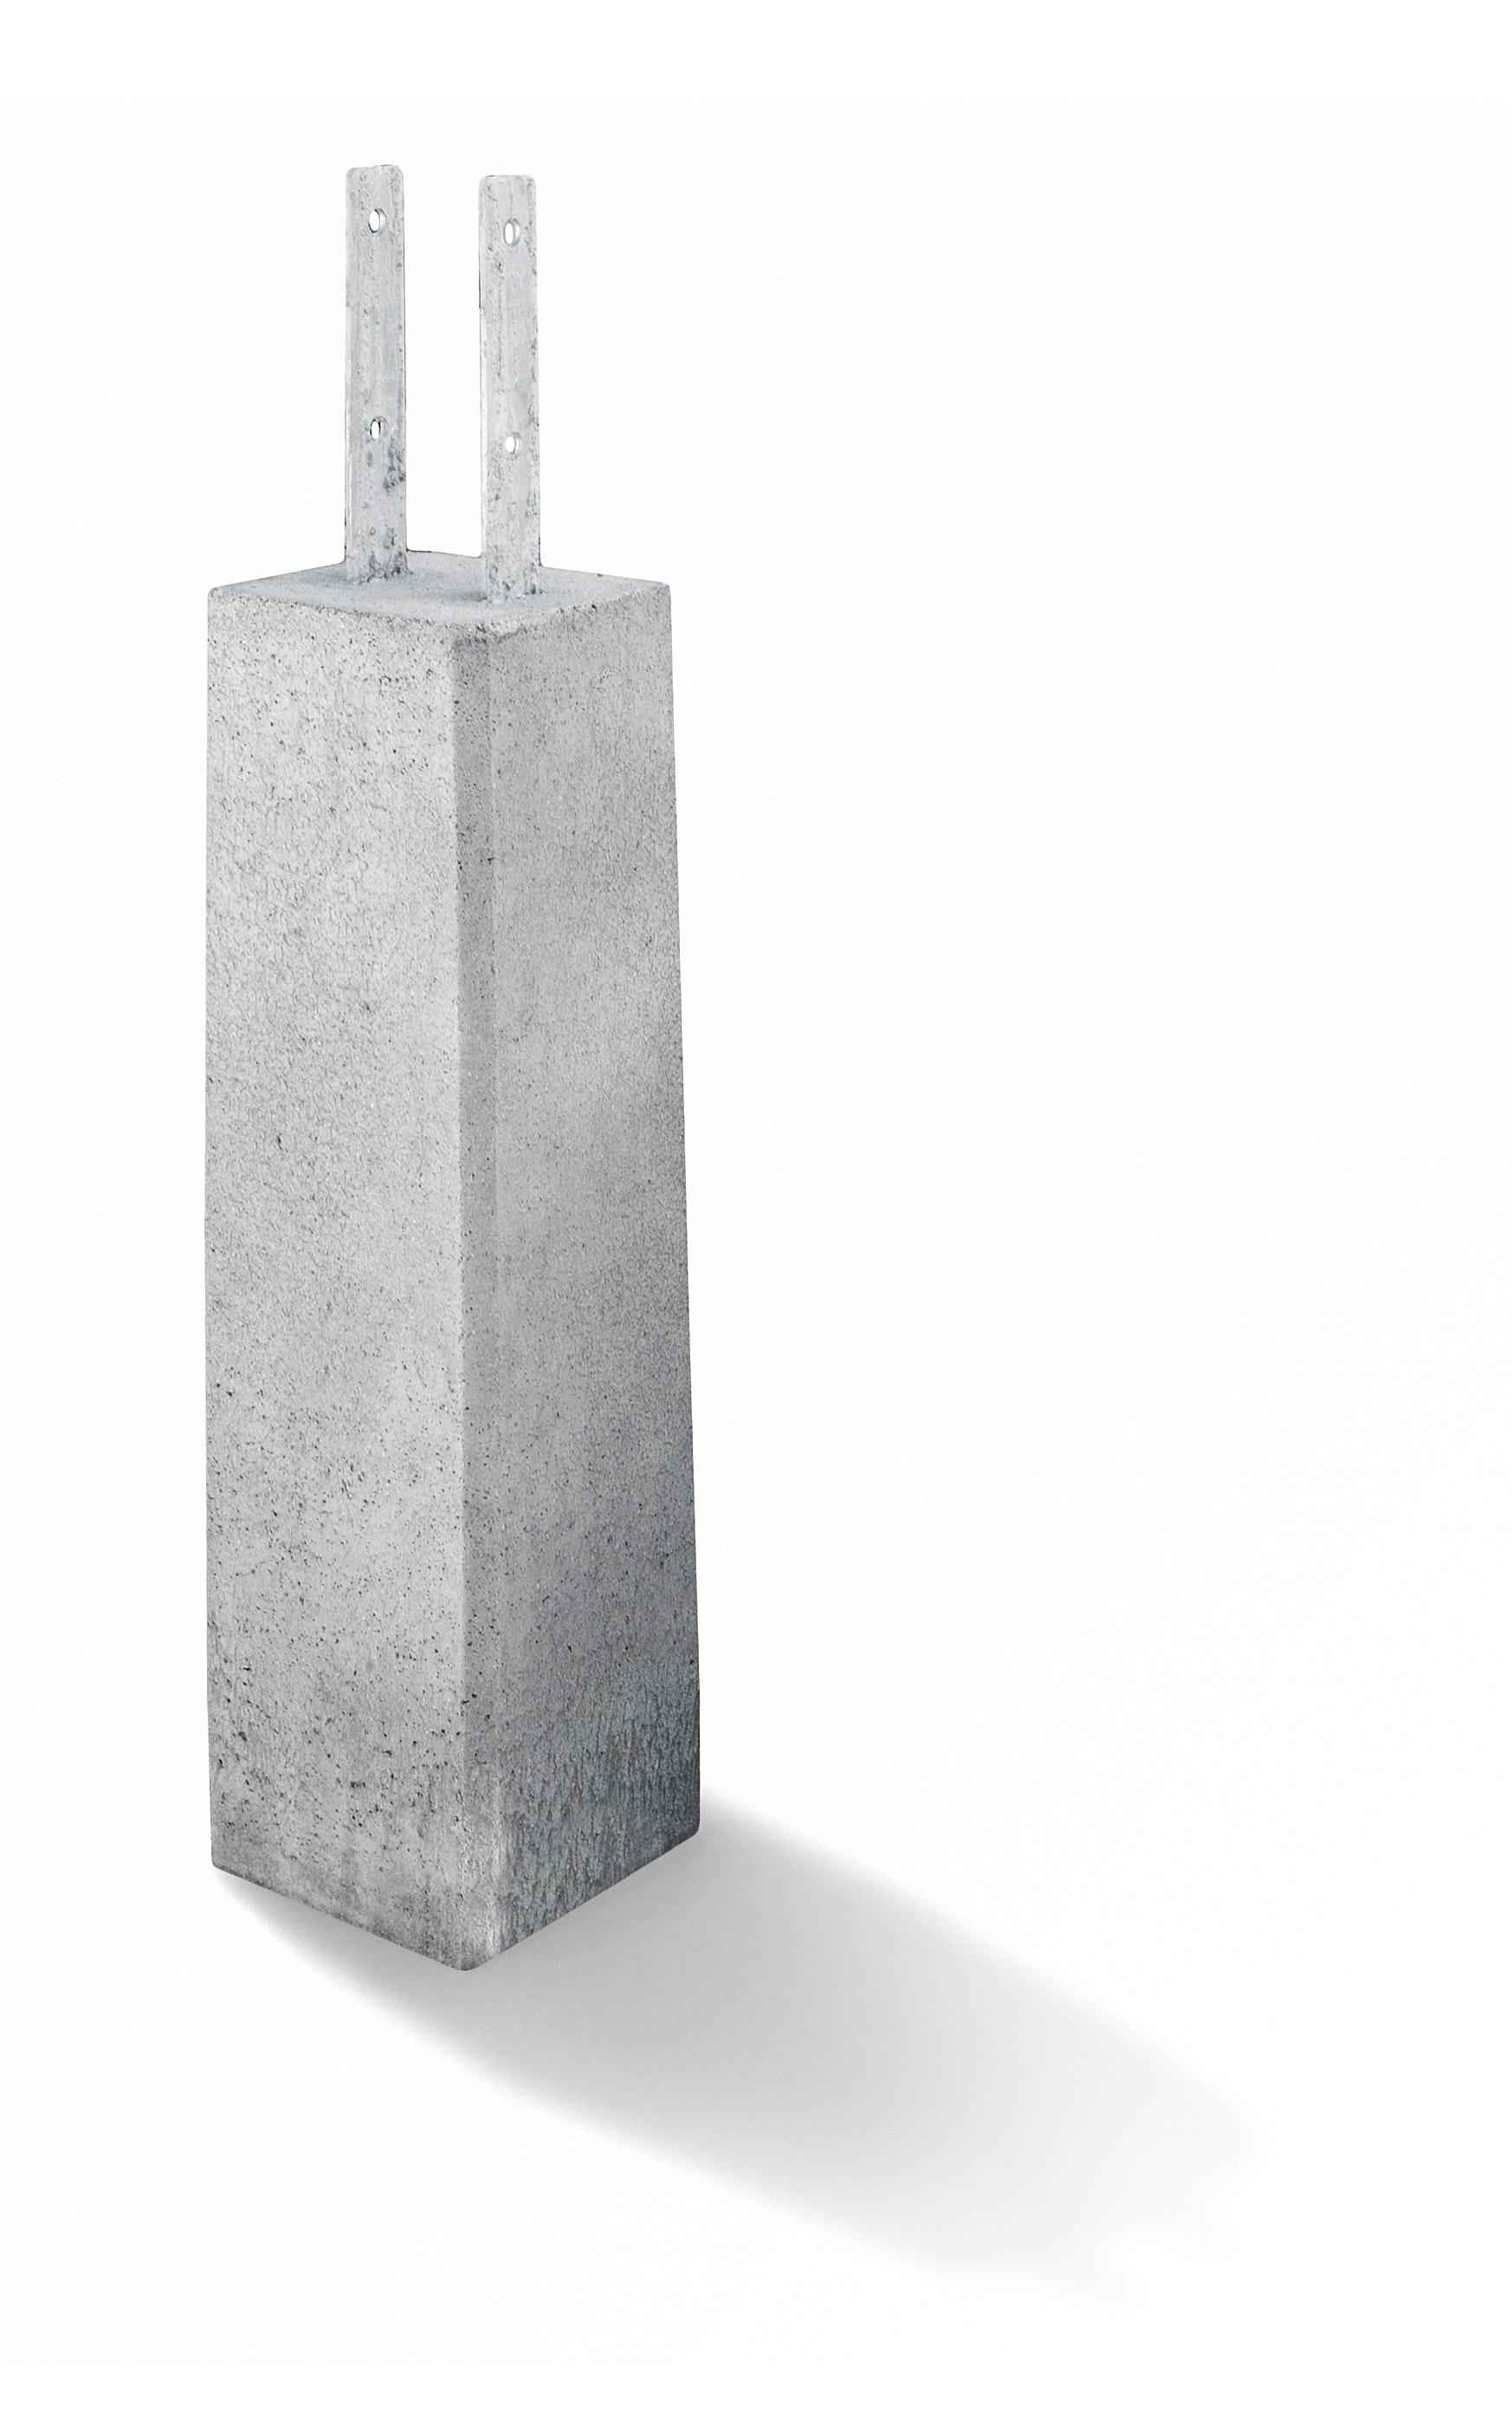 Plint S:t Eriks 100x500mm